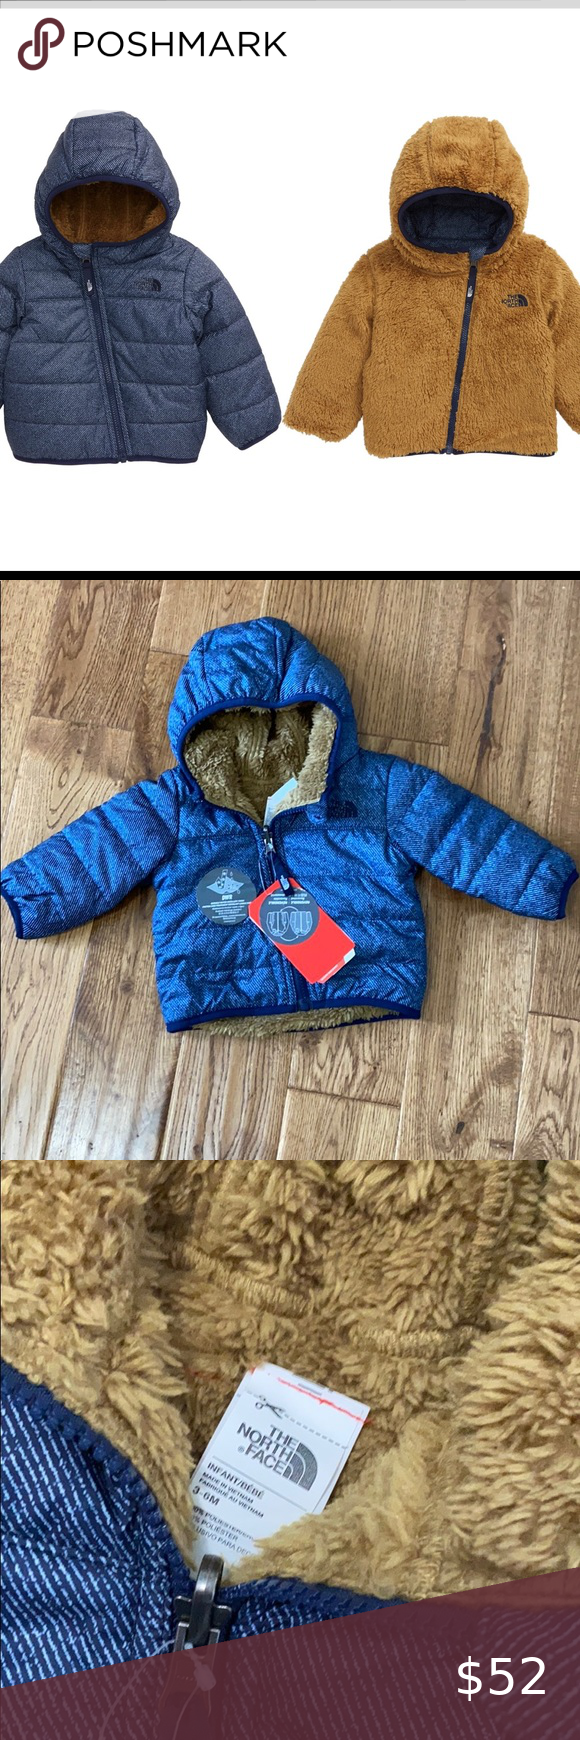 Nwt Baby Boys The North Face My Chimborazo Jacket New The North Face Baby Infant Boys Coat Jacket Parka Mount Chimborazo Reve The North Face Baby Boy Boys Coat [ 1740 x 580 Pixel ]